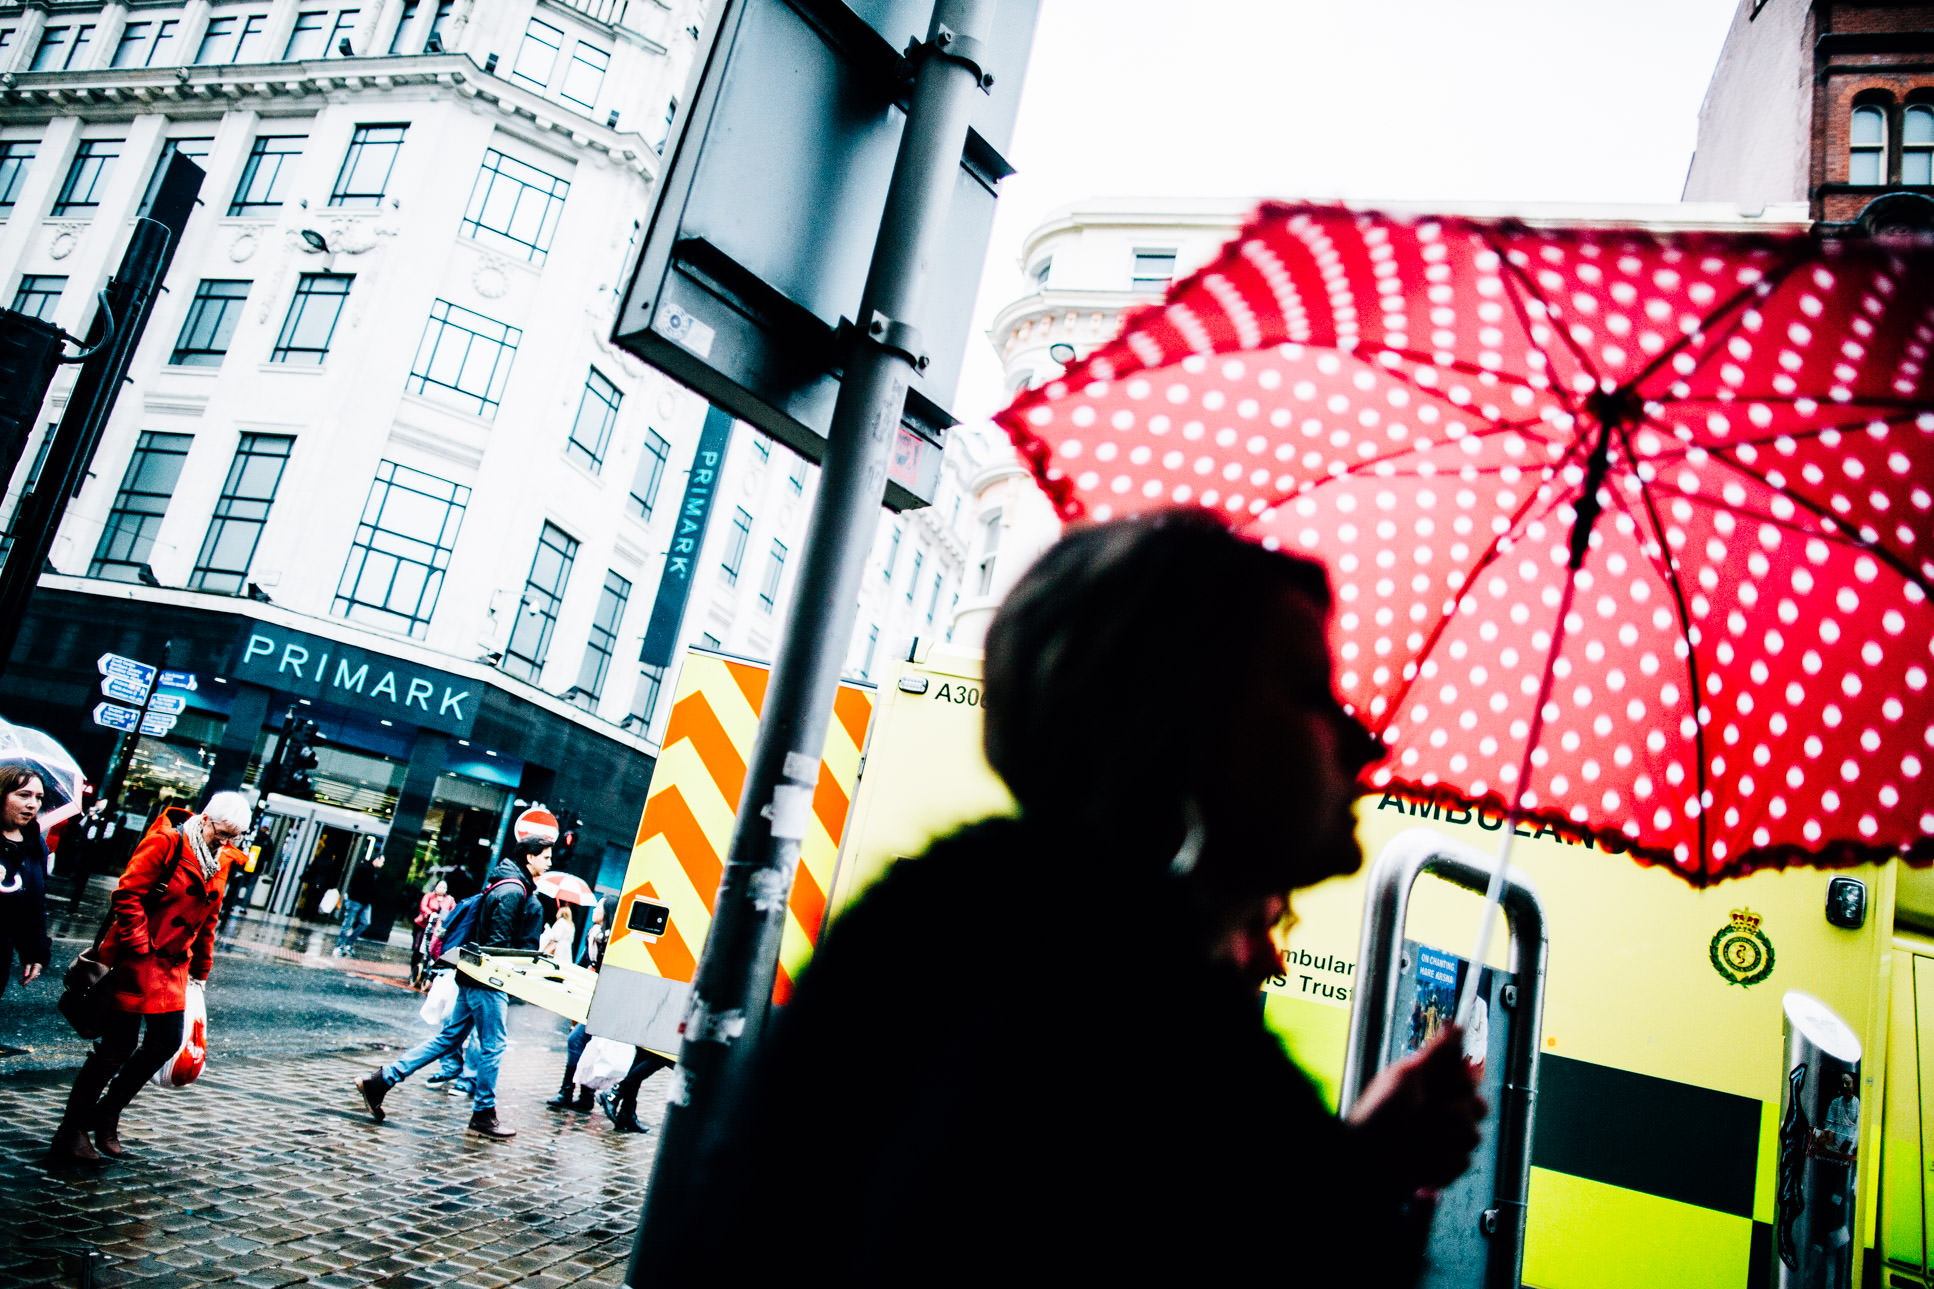 Street Photography34